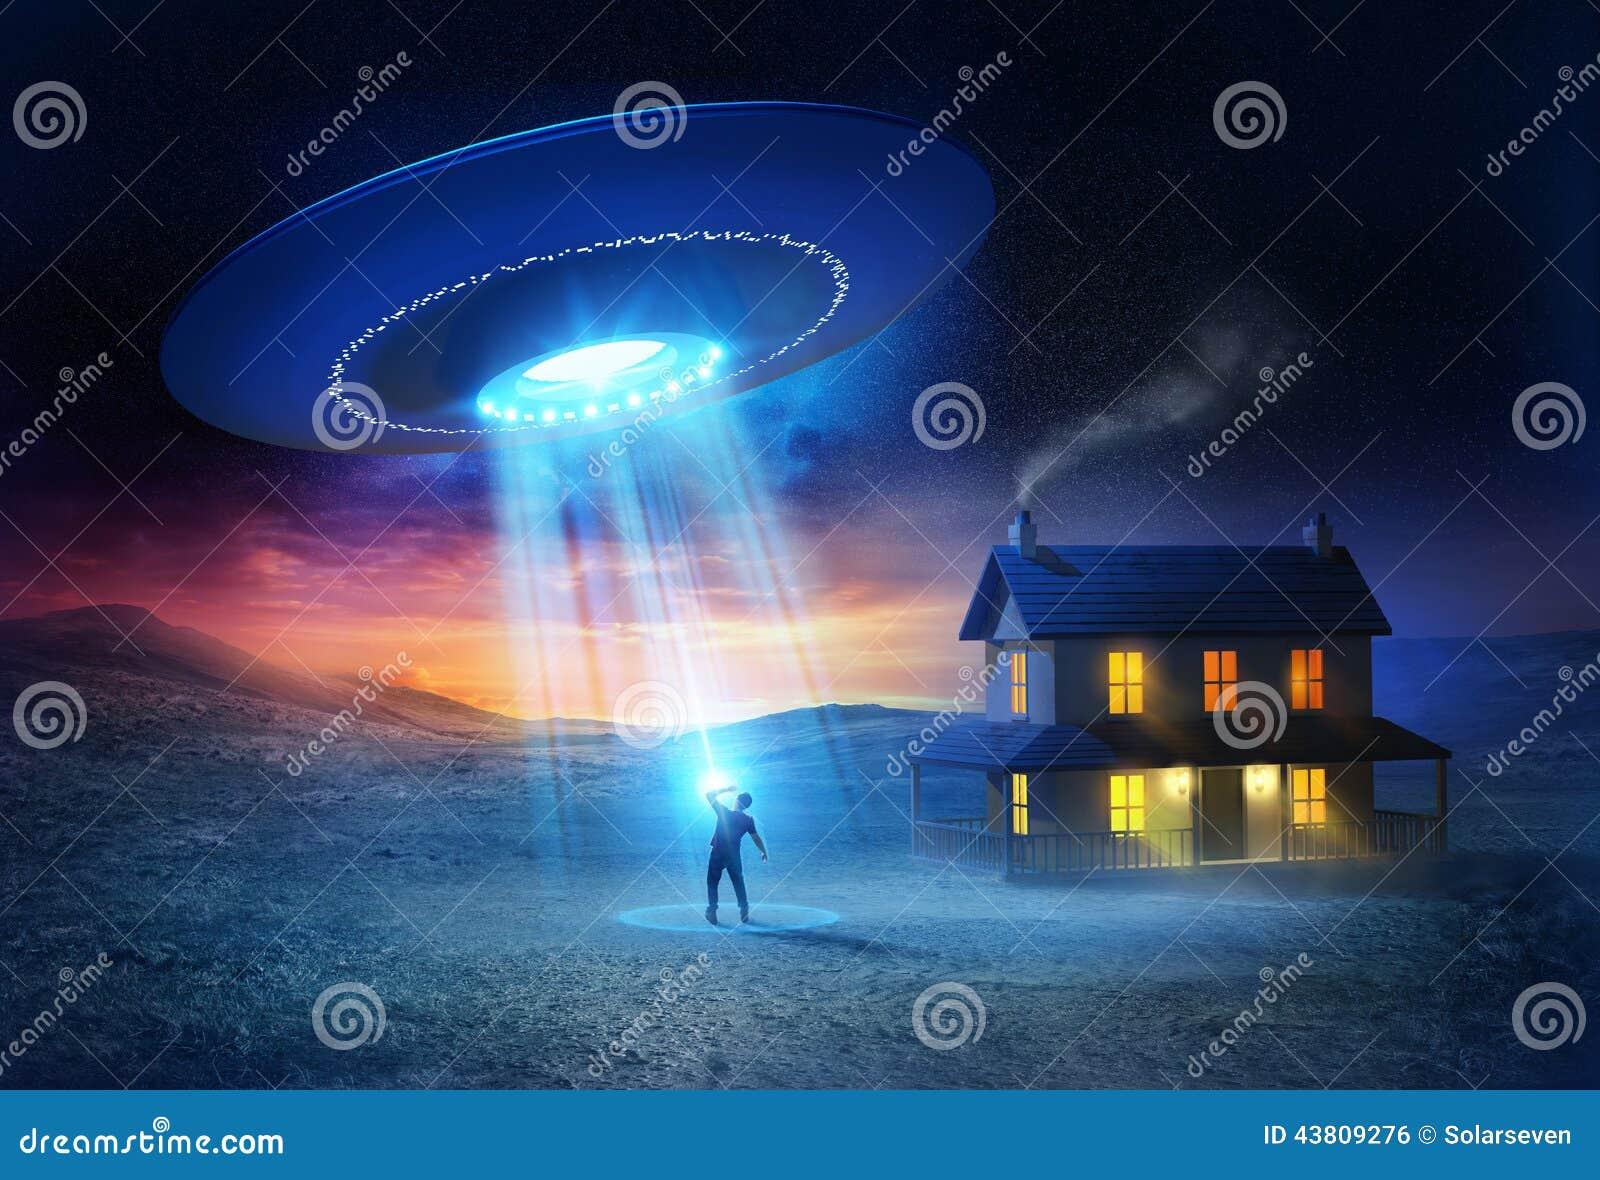 Ufokidnappning